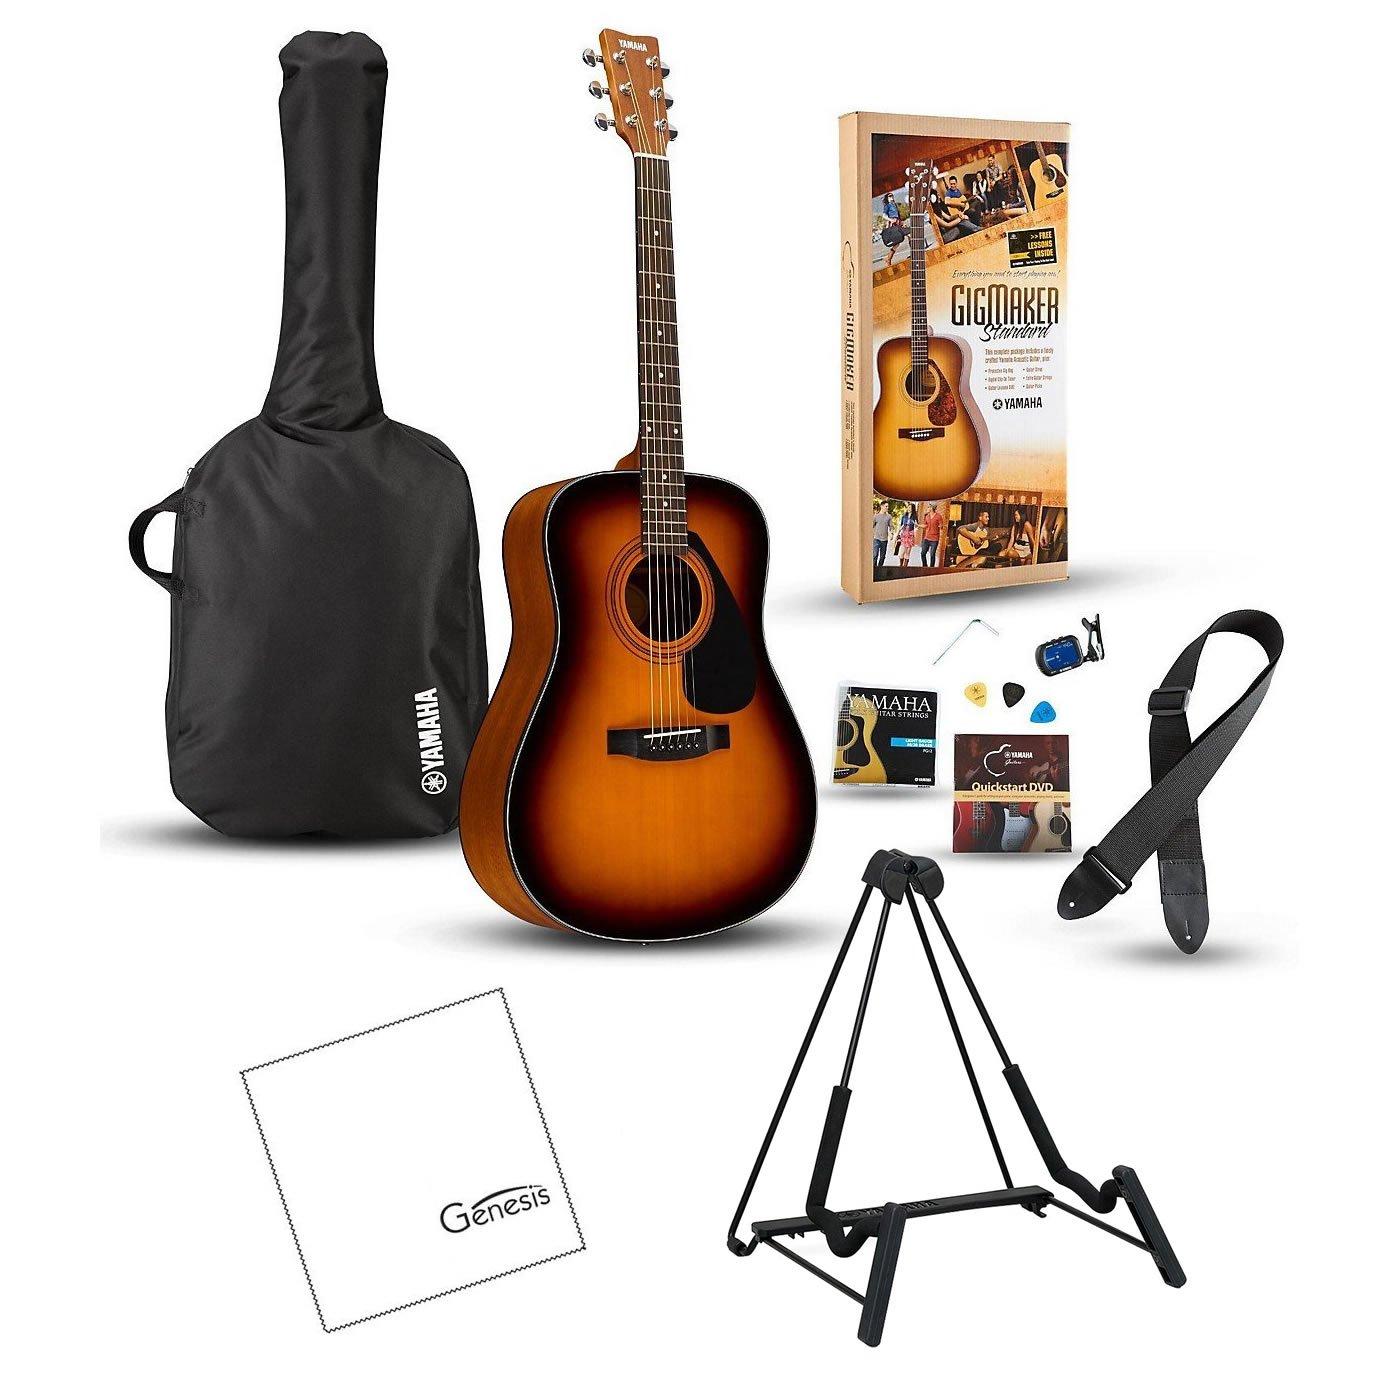 Yamaha GigMaker Standard Acoustic Guitar Package (Tobacco Sunburst) with FREE Bonus Guitar Stand & Polishing Cloth Yamaha Genesis